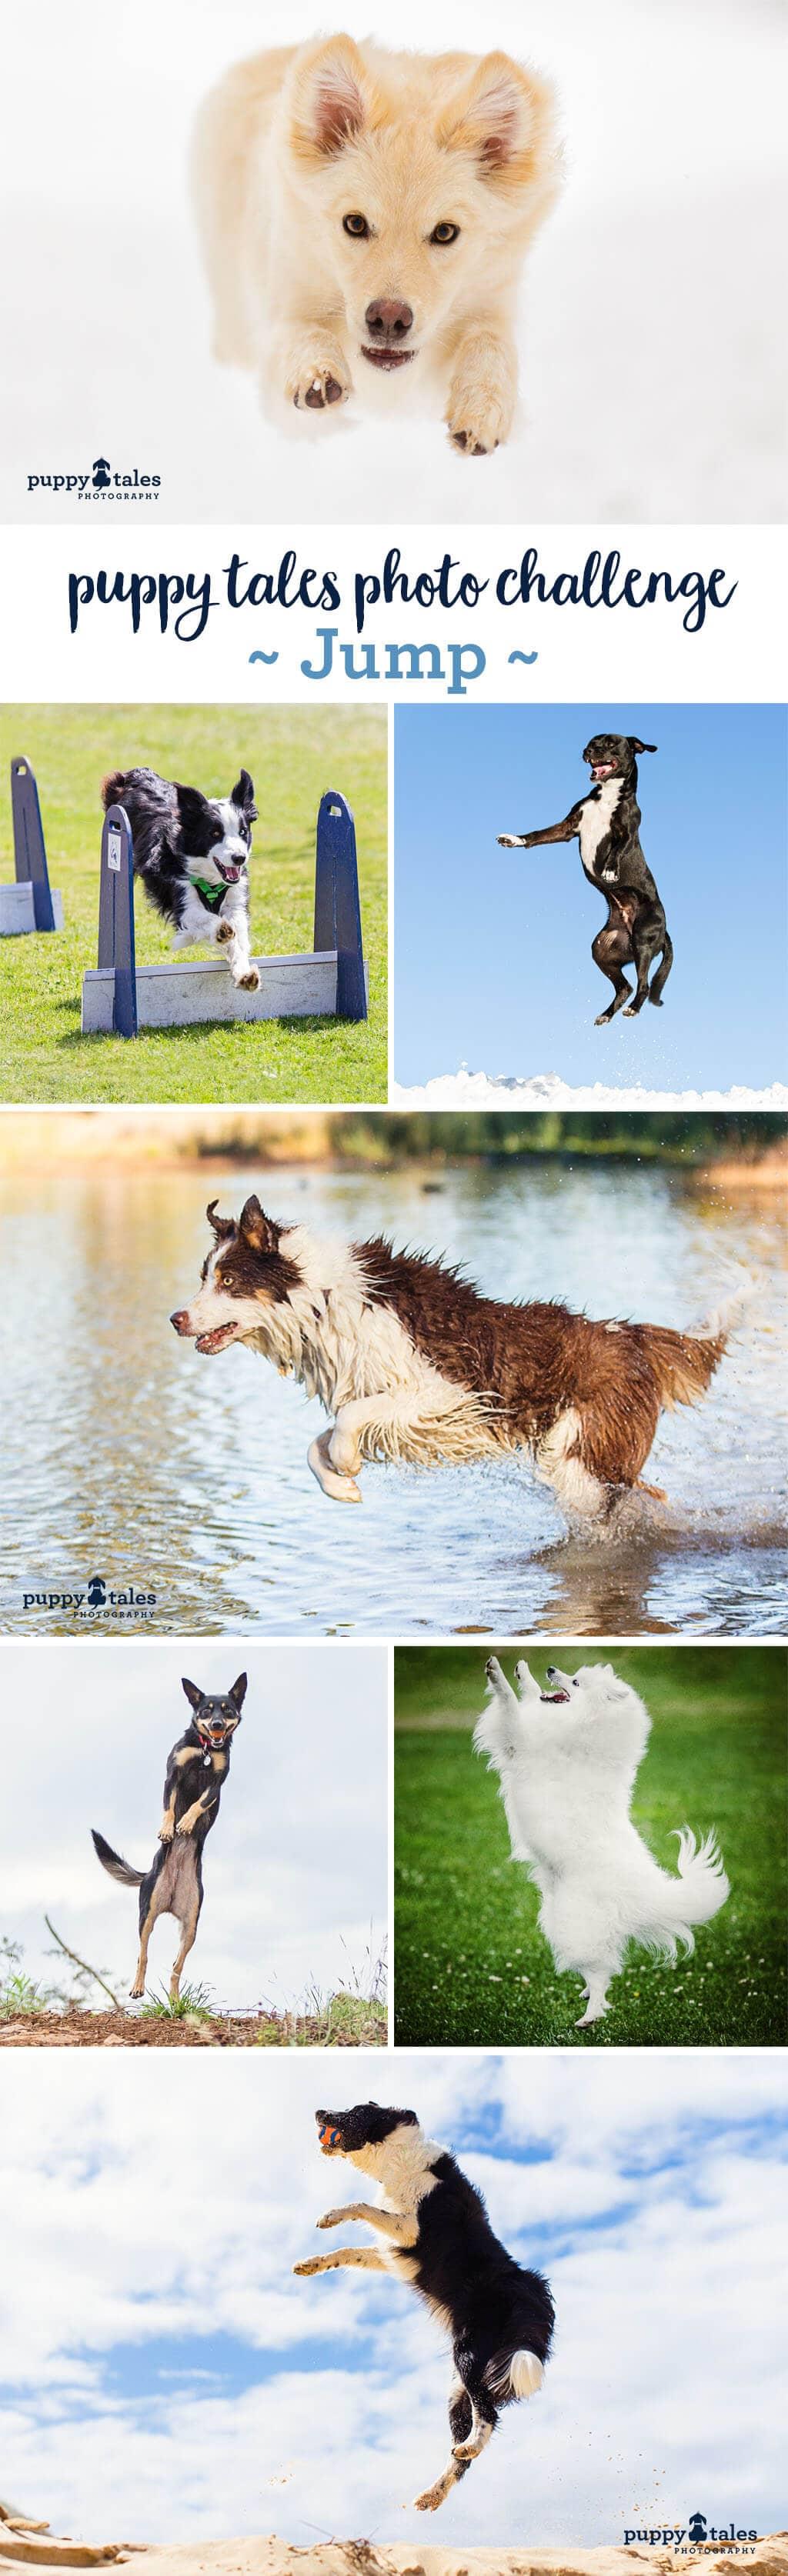 Puppy Tales Photo Challenge ~ Jump